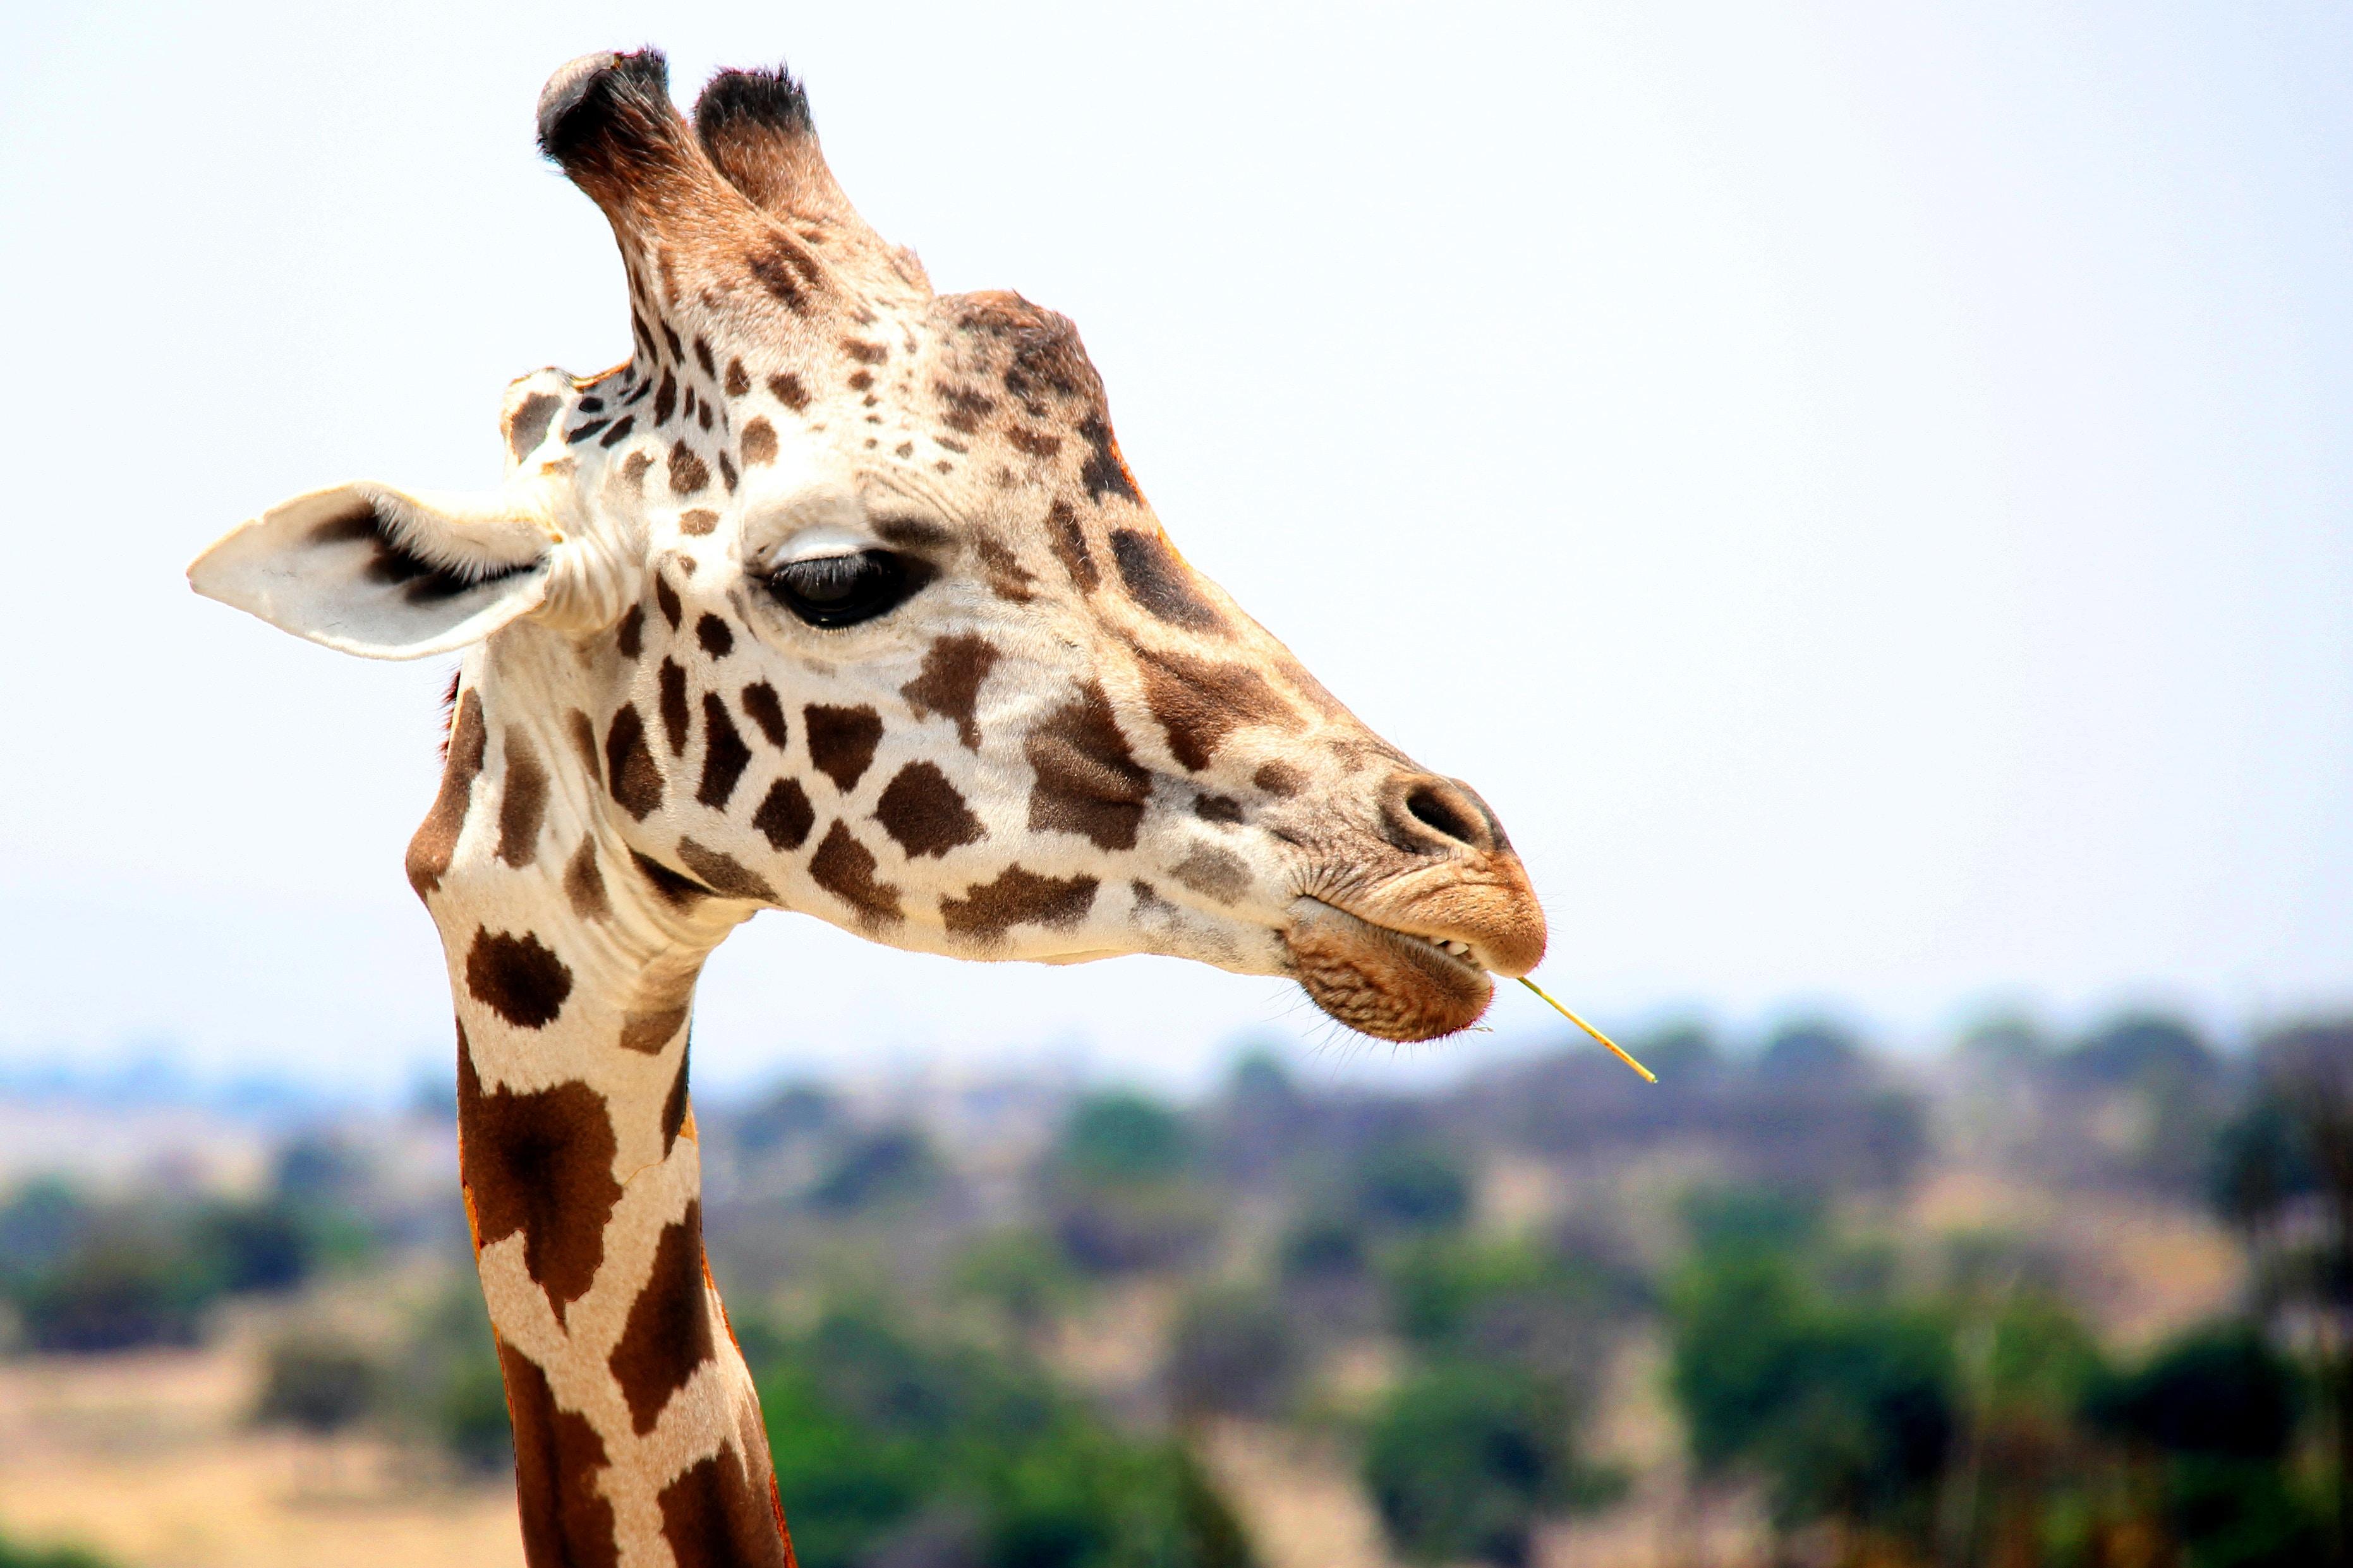 giraffe eating during daytime